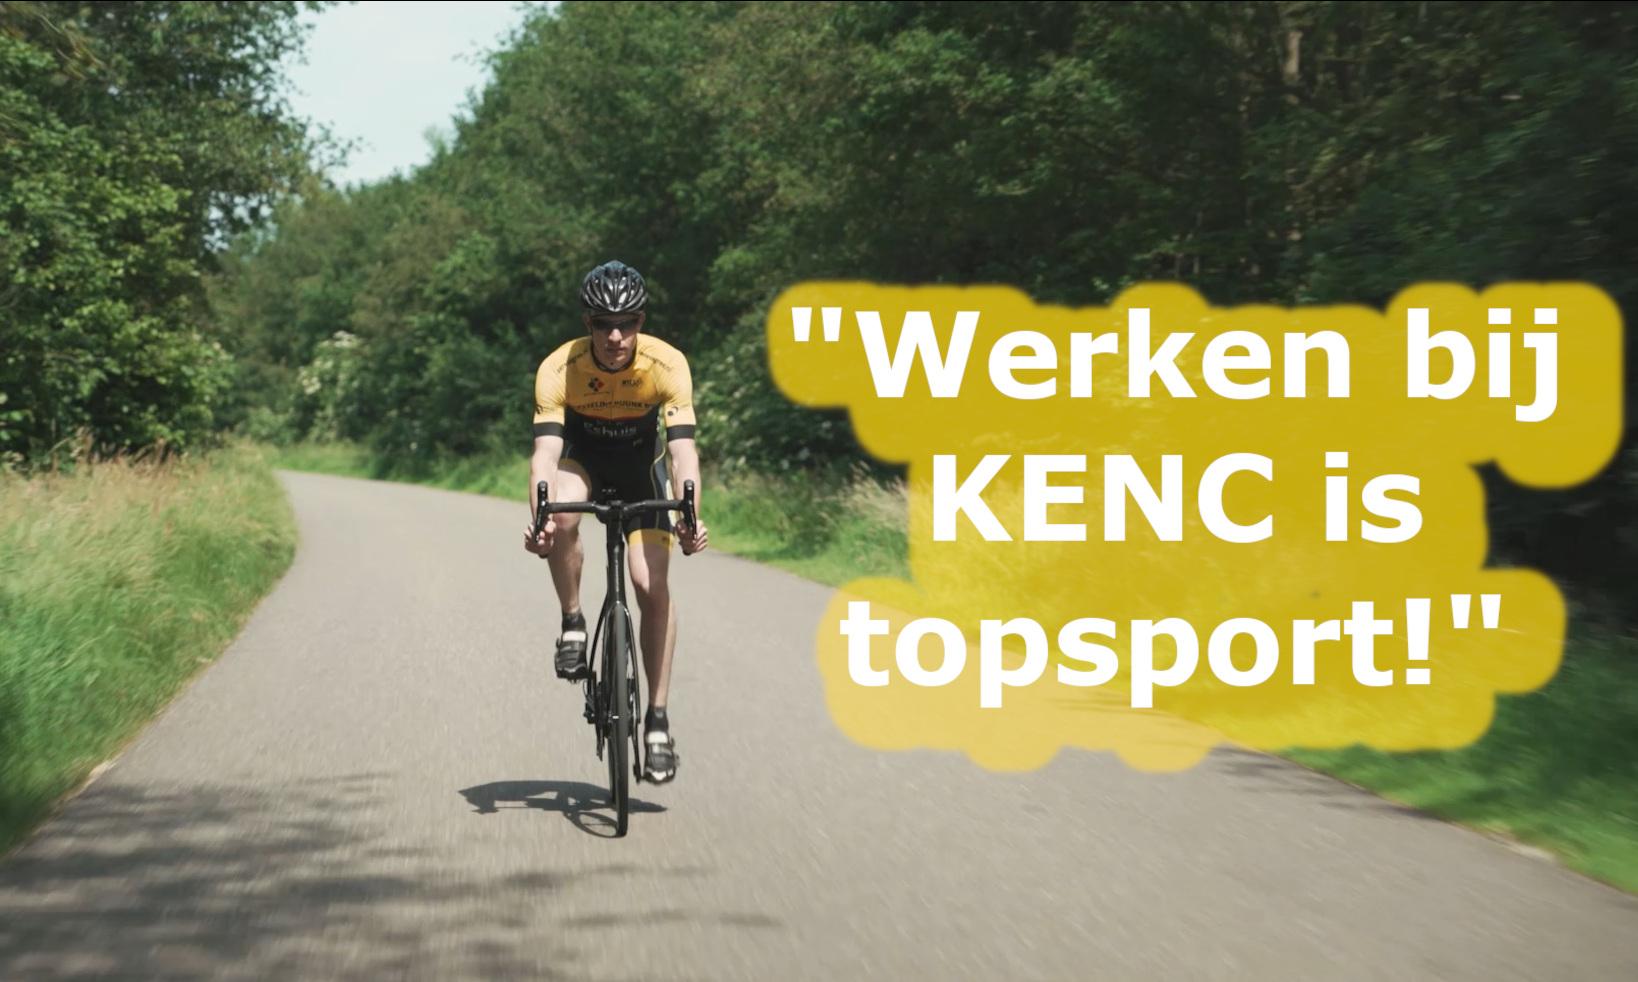 TEAM KENC #1